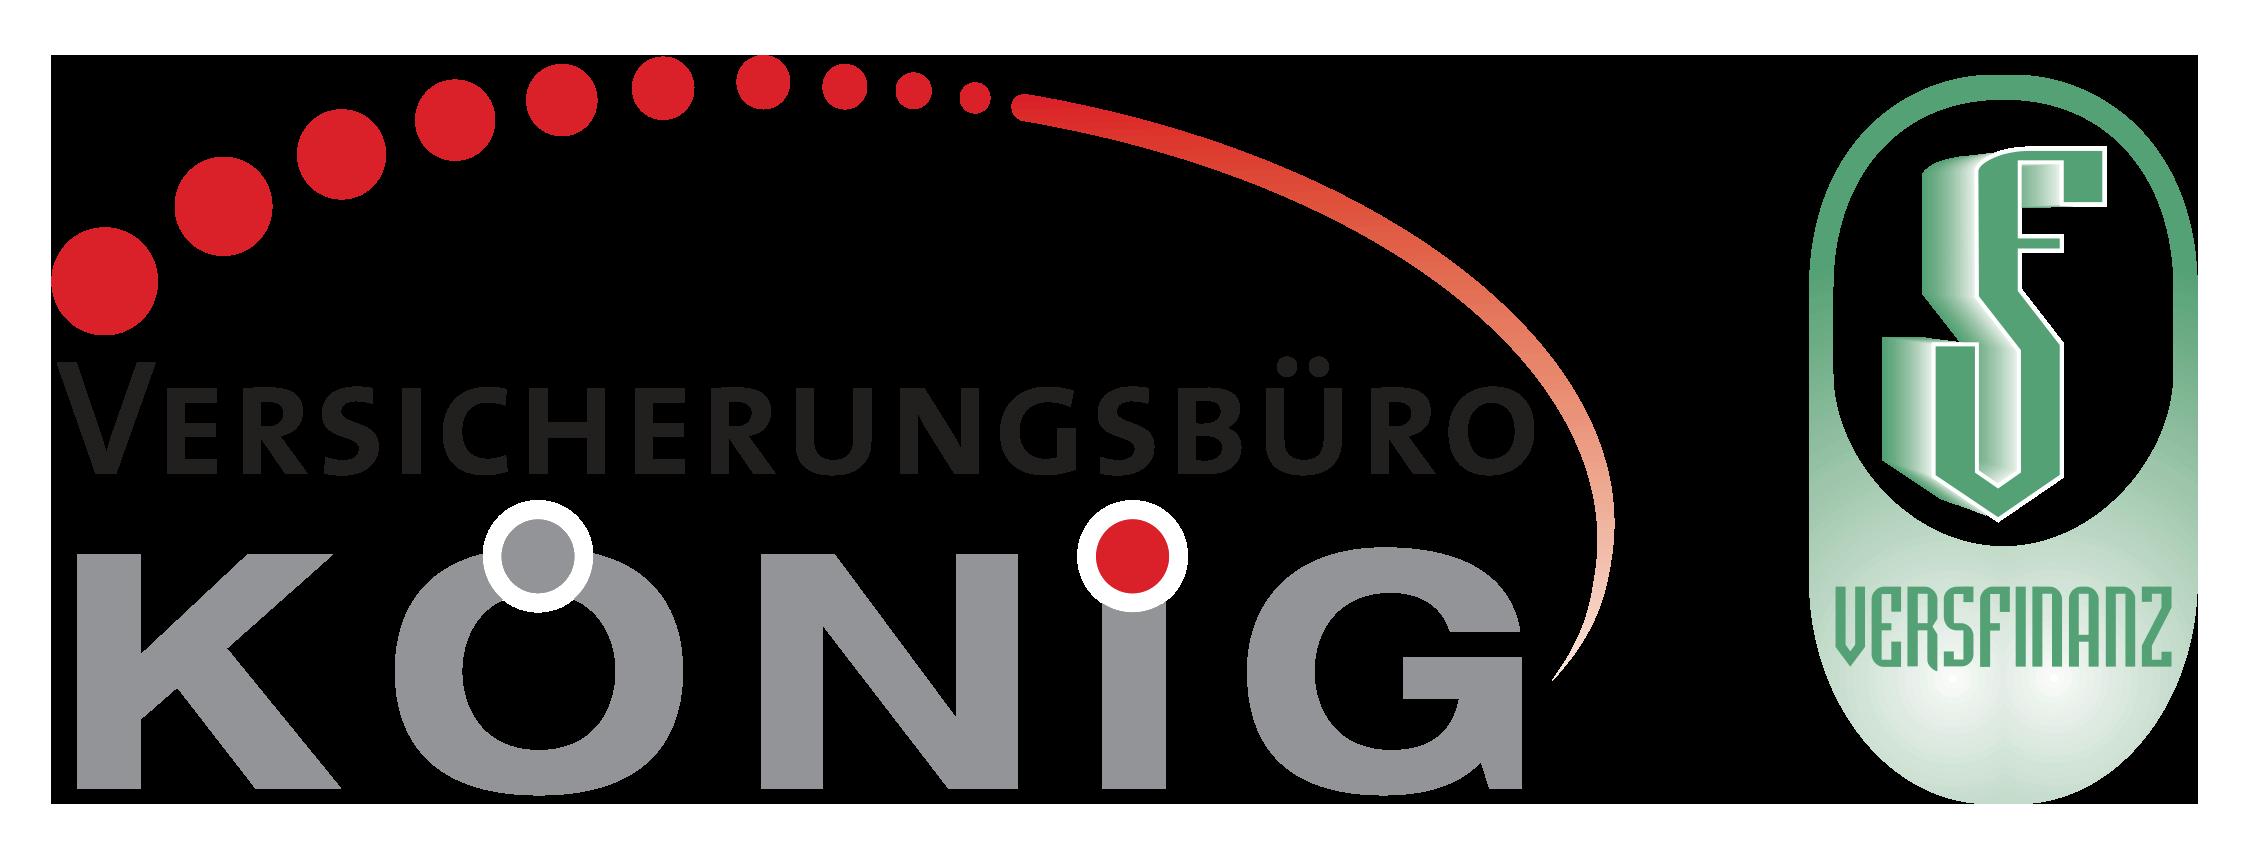 Versicherungsbüro König / Martina & Werner König